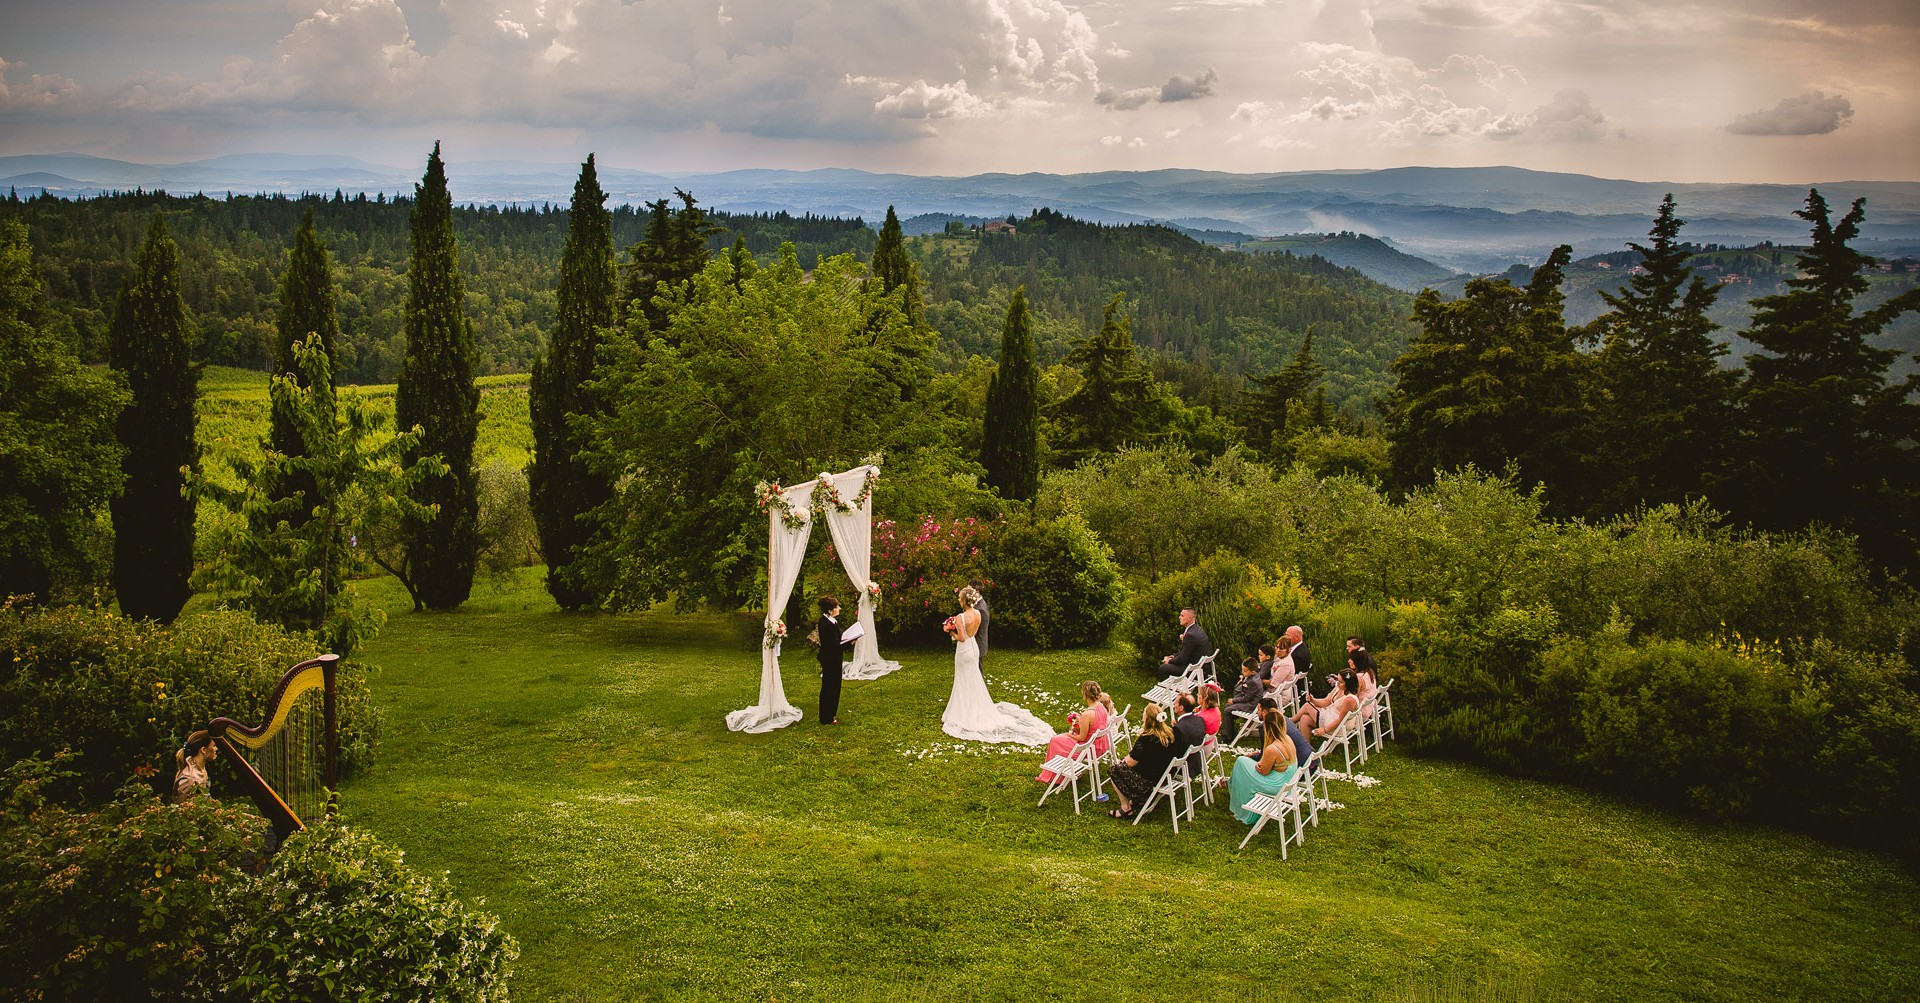 Miglior-wedding-photographer-in-Italia